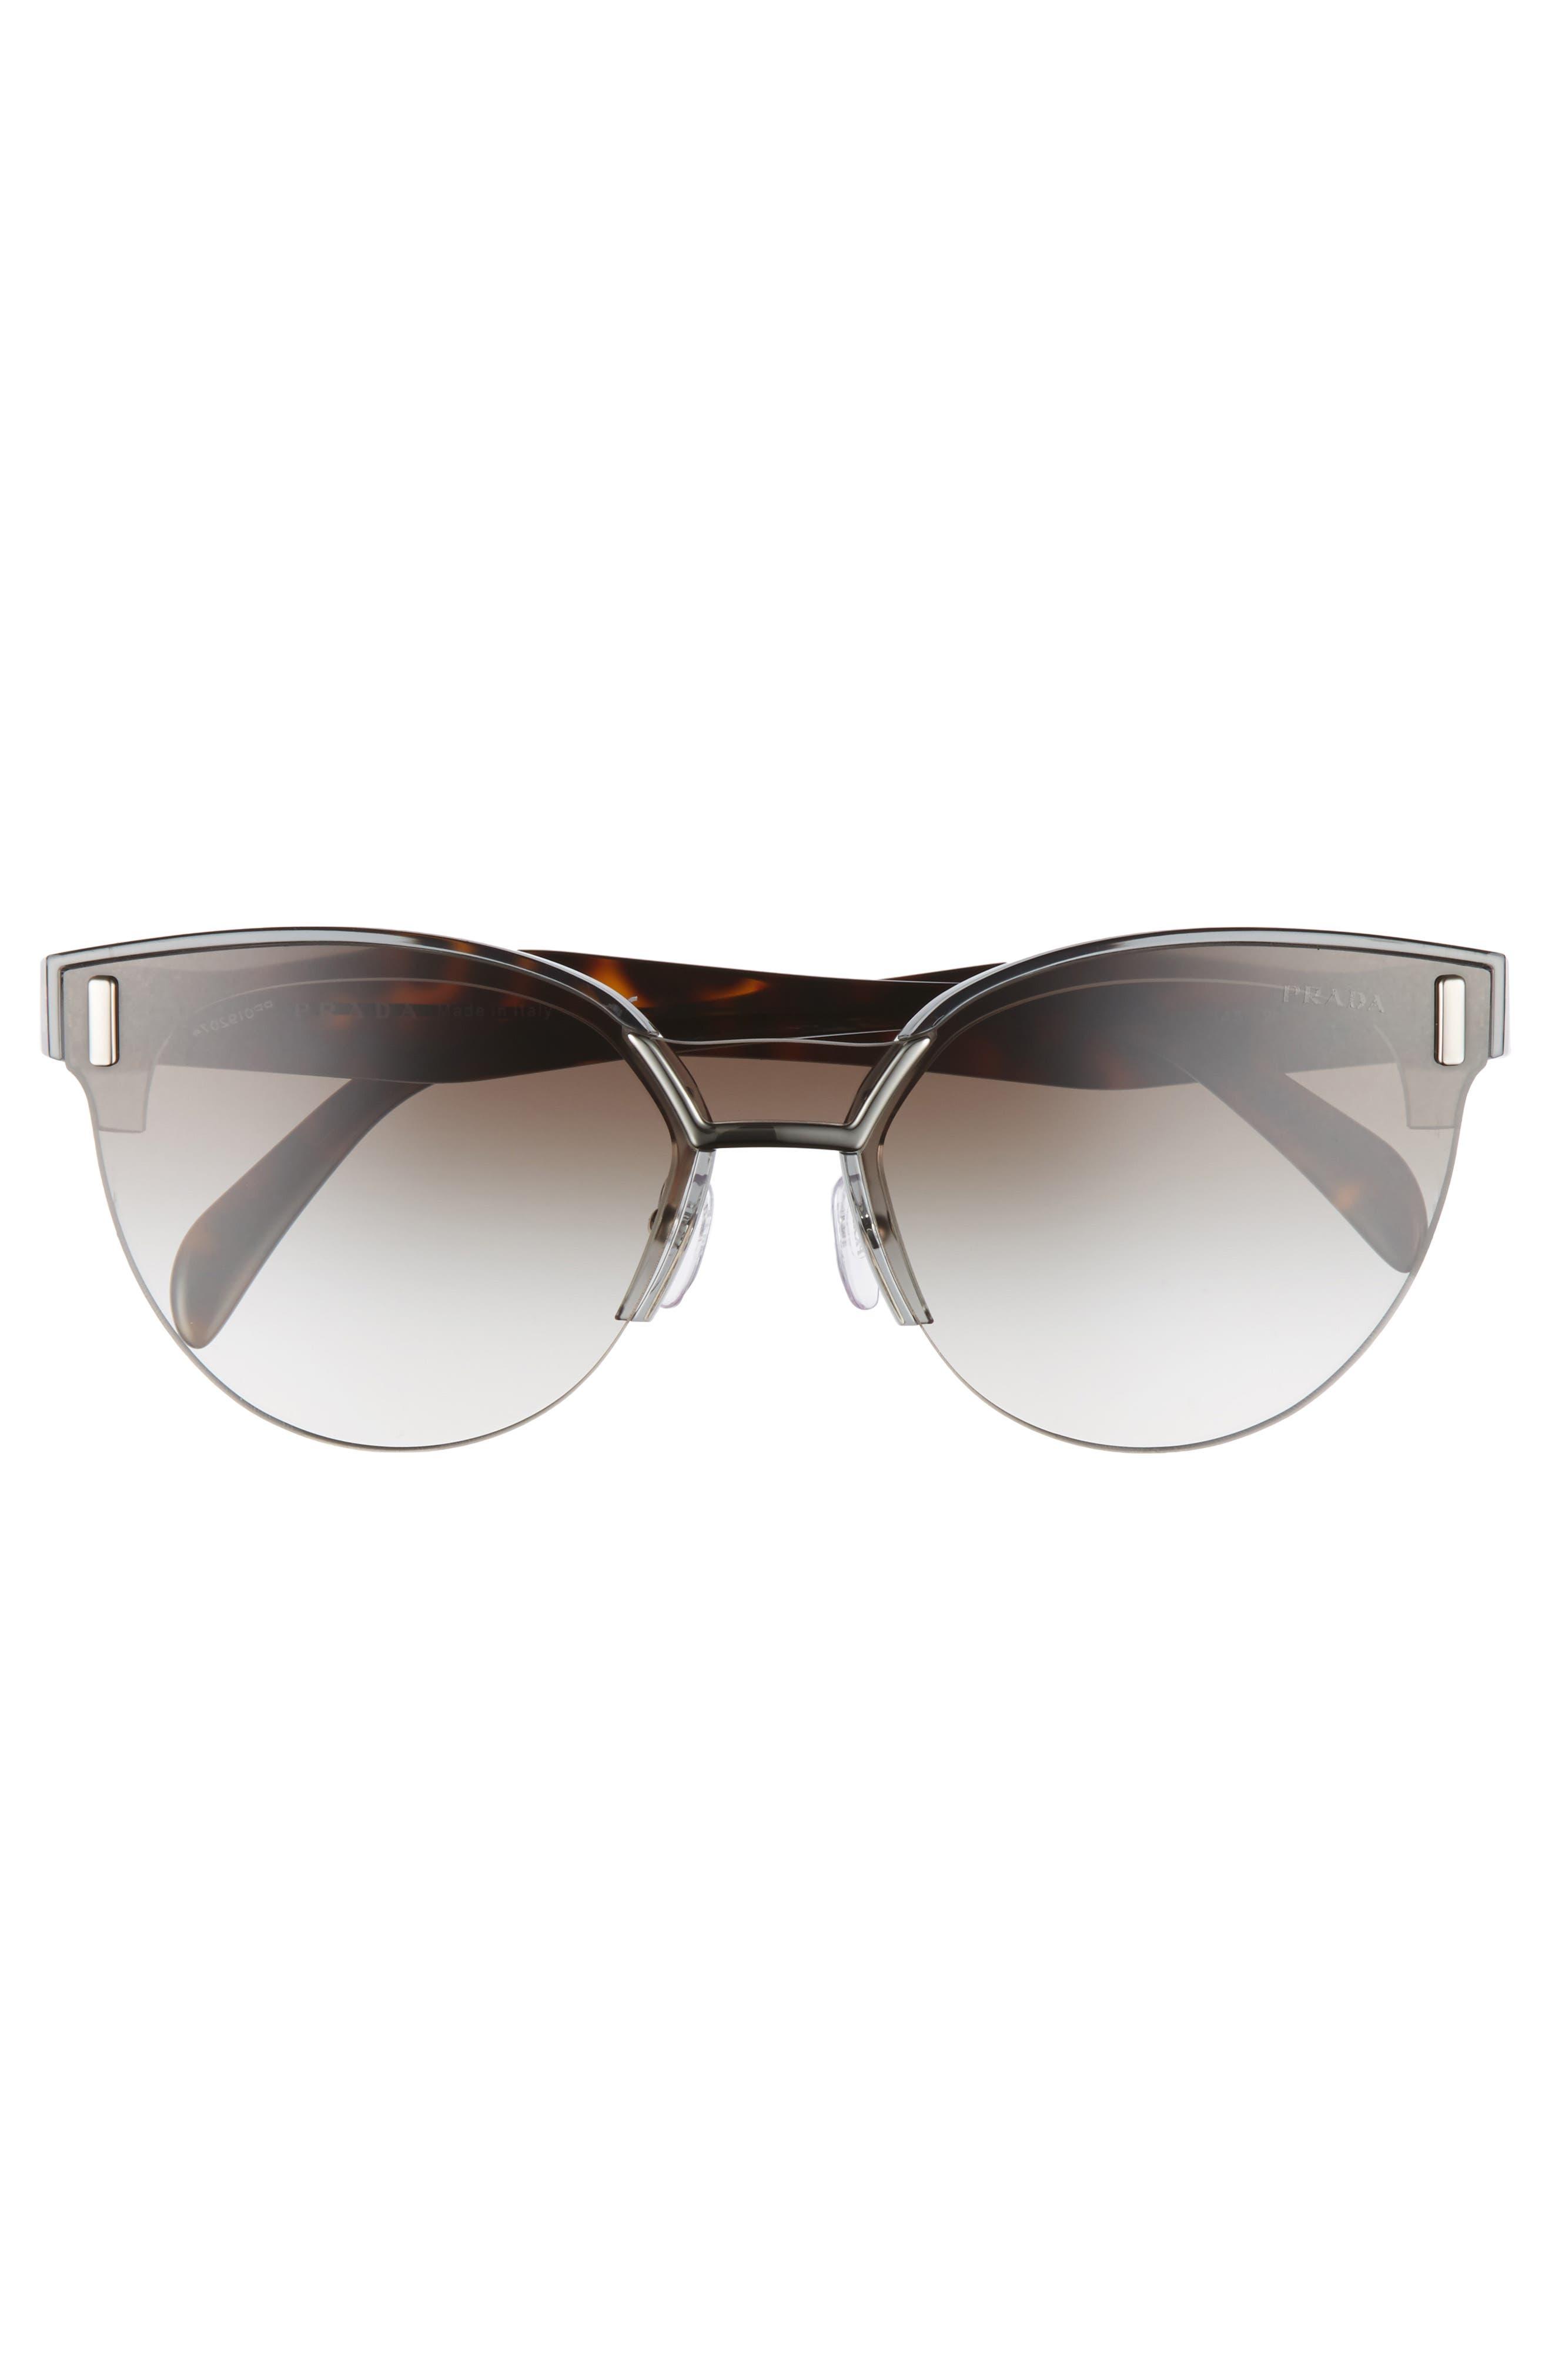 50mm Semi Rimless Gradient Sunglasses,                             Alternate thumbnail 3, color,                             Grey Gradient